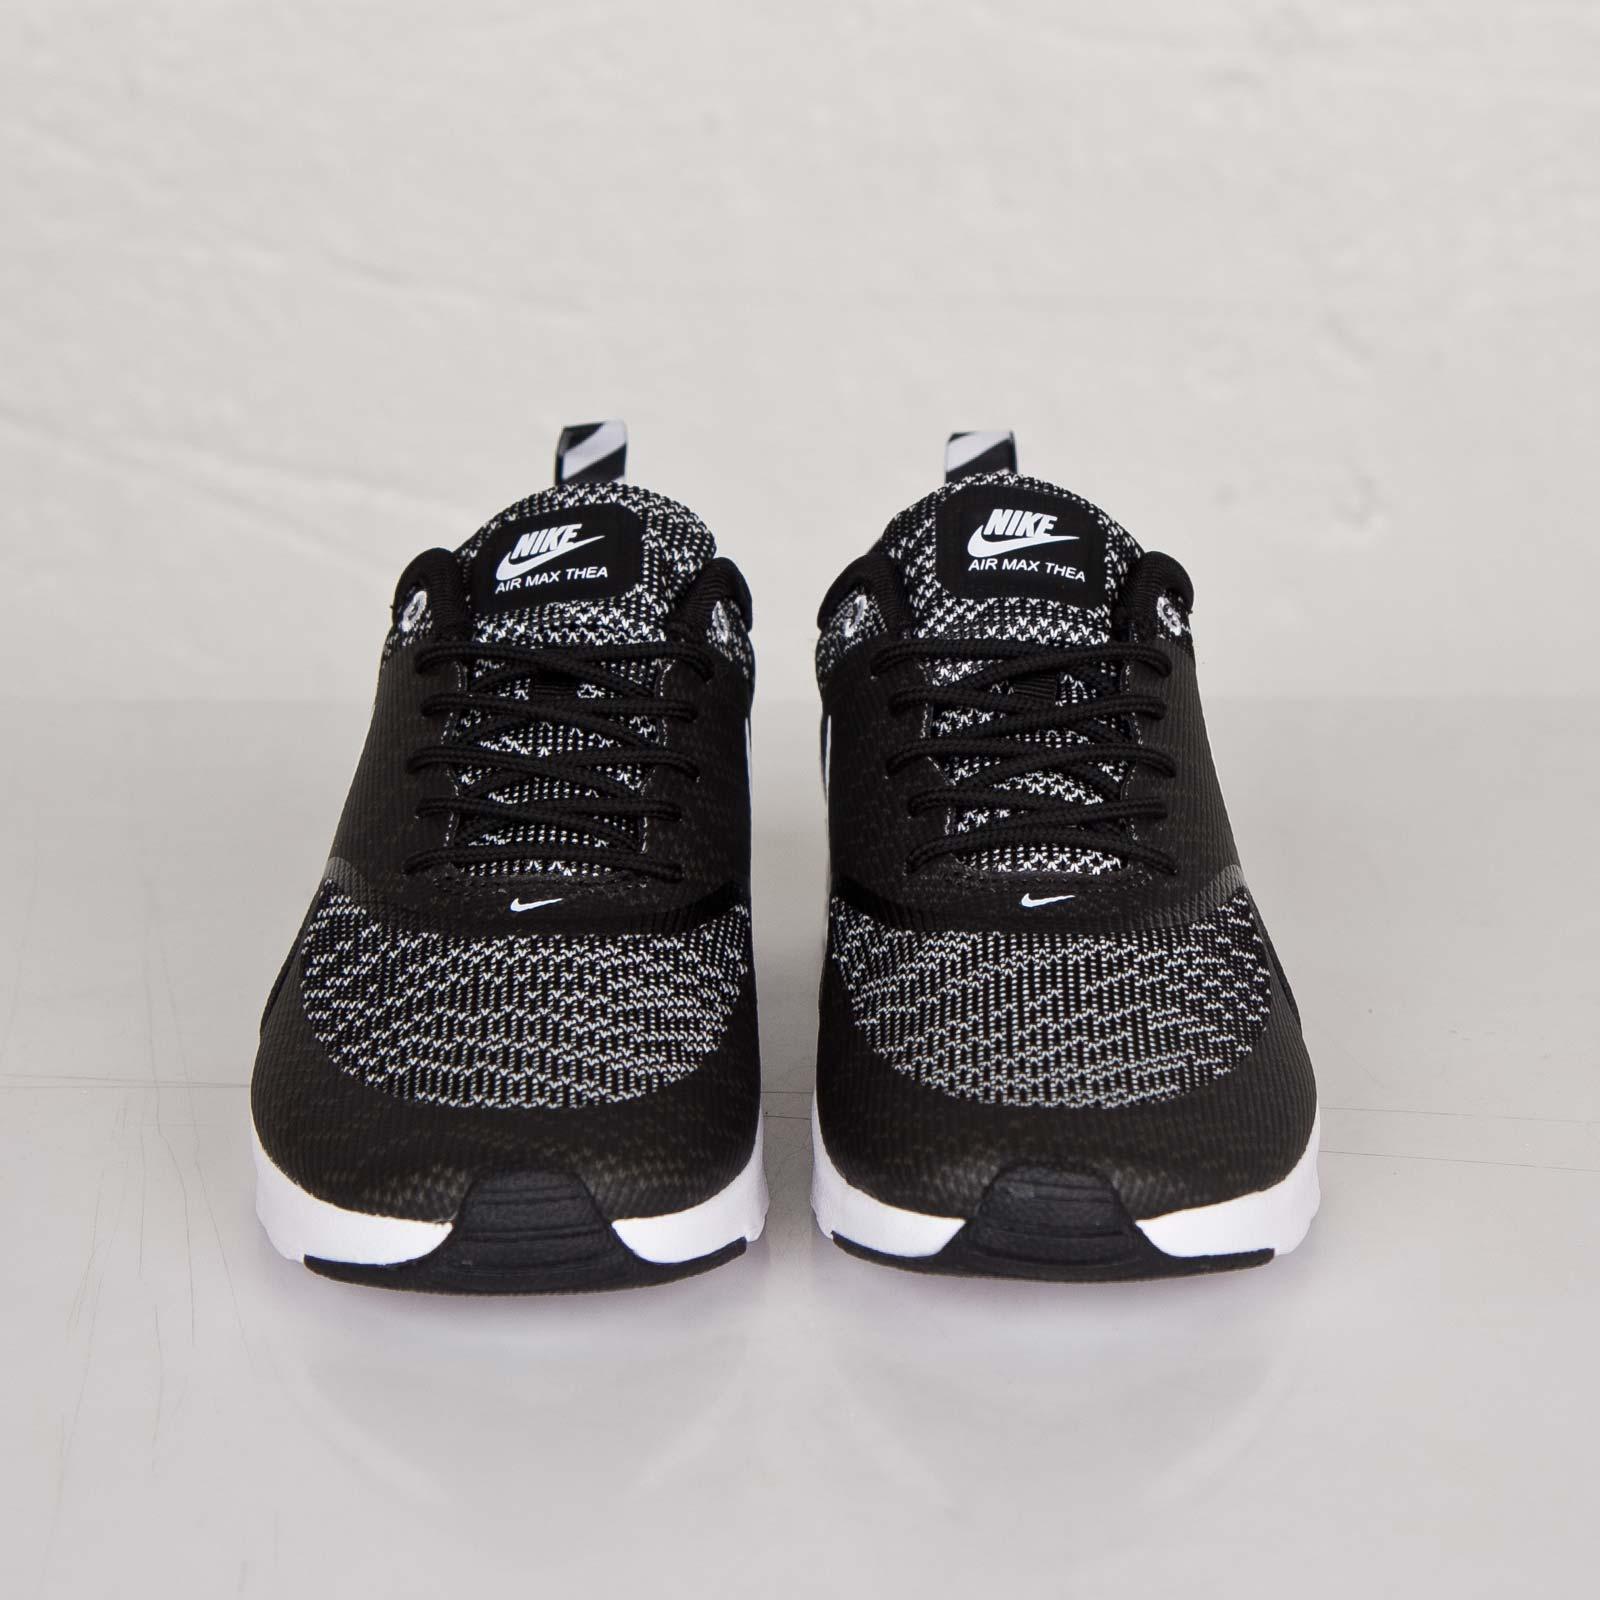 8e3efc832f Nike W Air Max Thea Knit Jacquard - 718646-001 - Sneakersnstuff | sneakers  & streetwear online since 1999